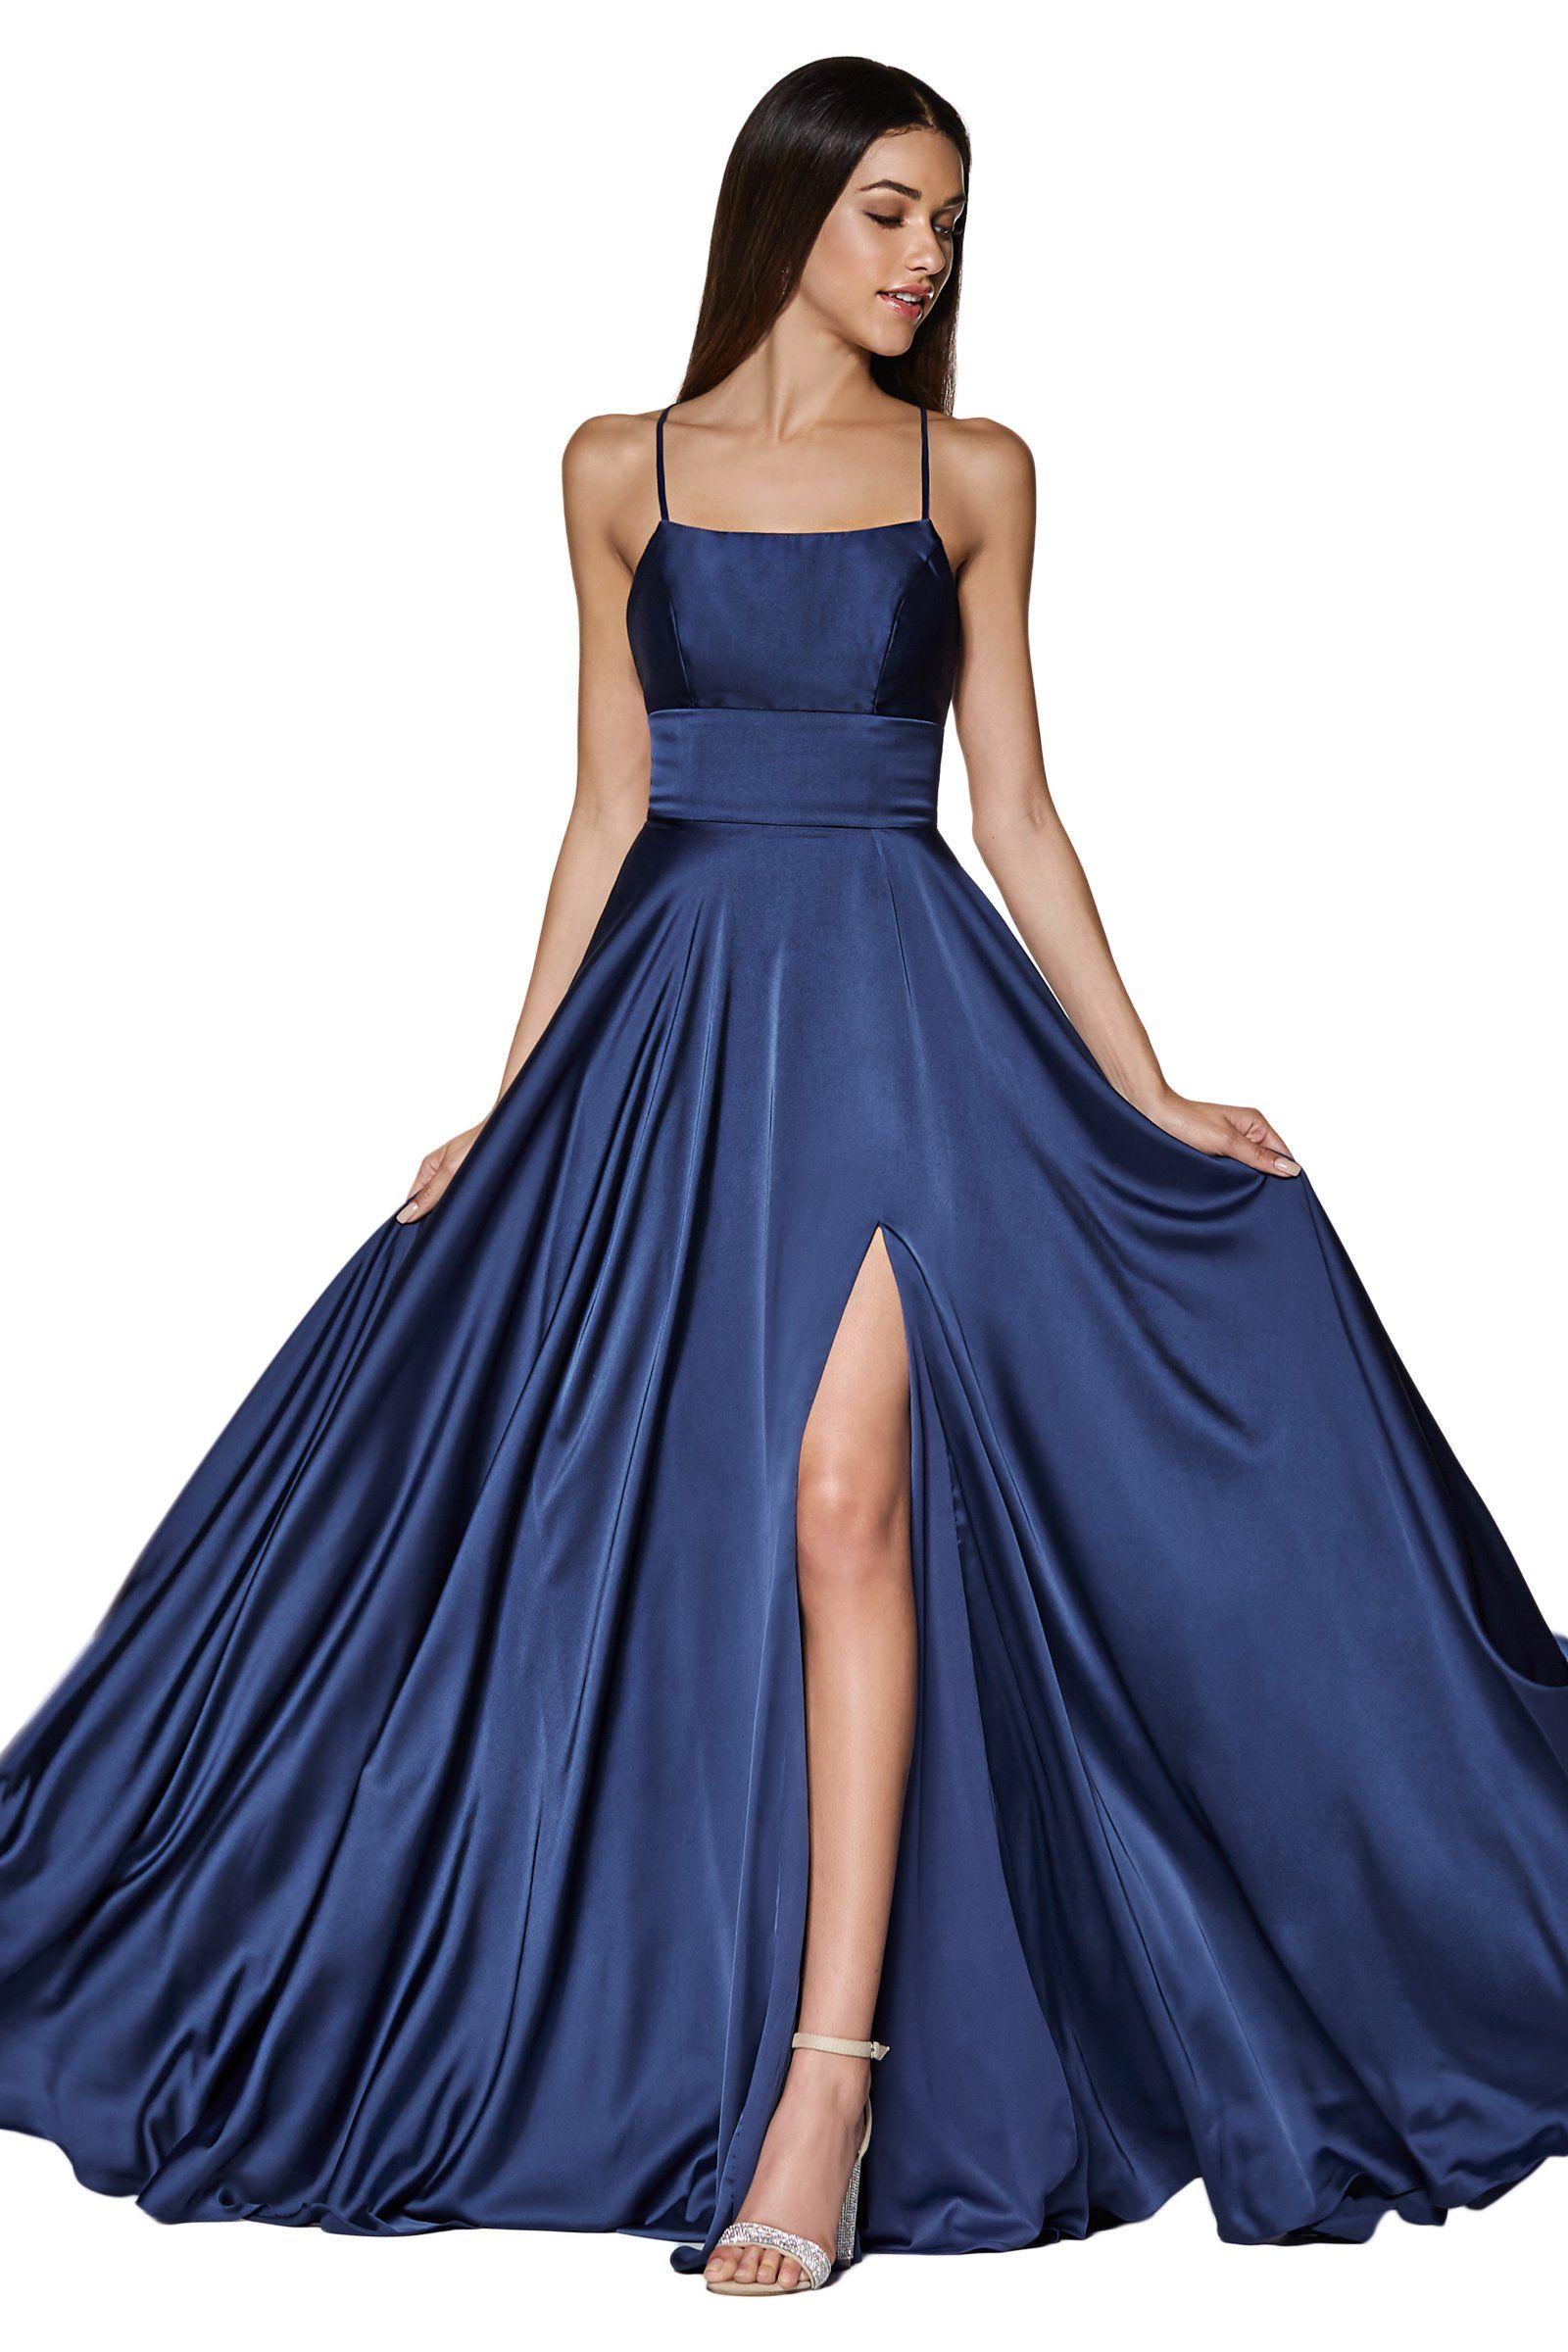 Cinderella Divine Cj527 Long Crisscross Back Satin A Line Dress Stunning Prom Dresses Satin Dress Long Trendy Prom Dresses [ 2400 x 1600 Pixel ]